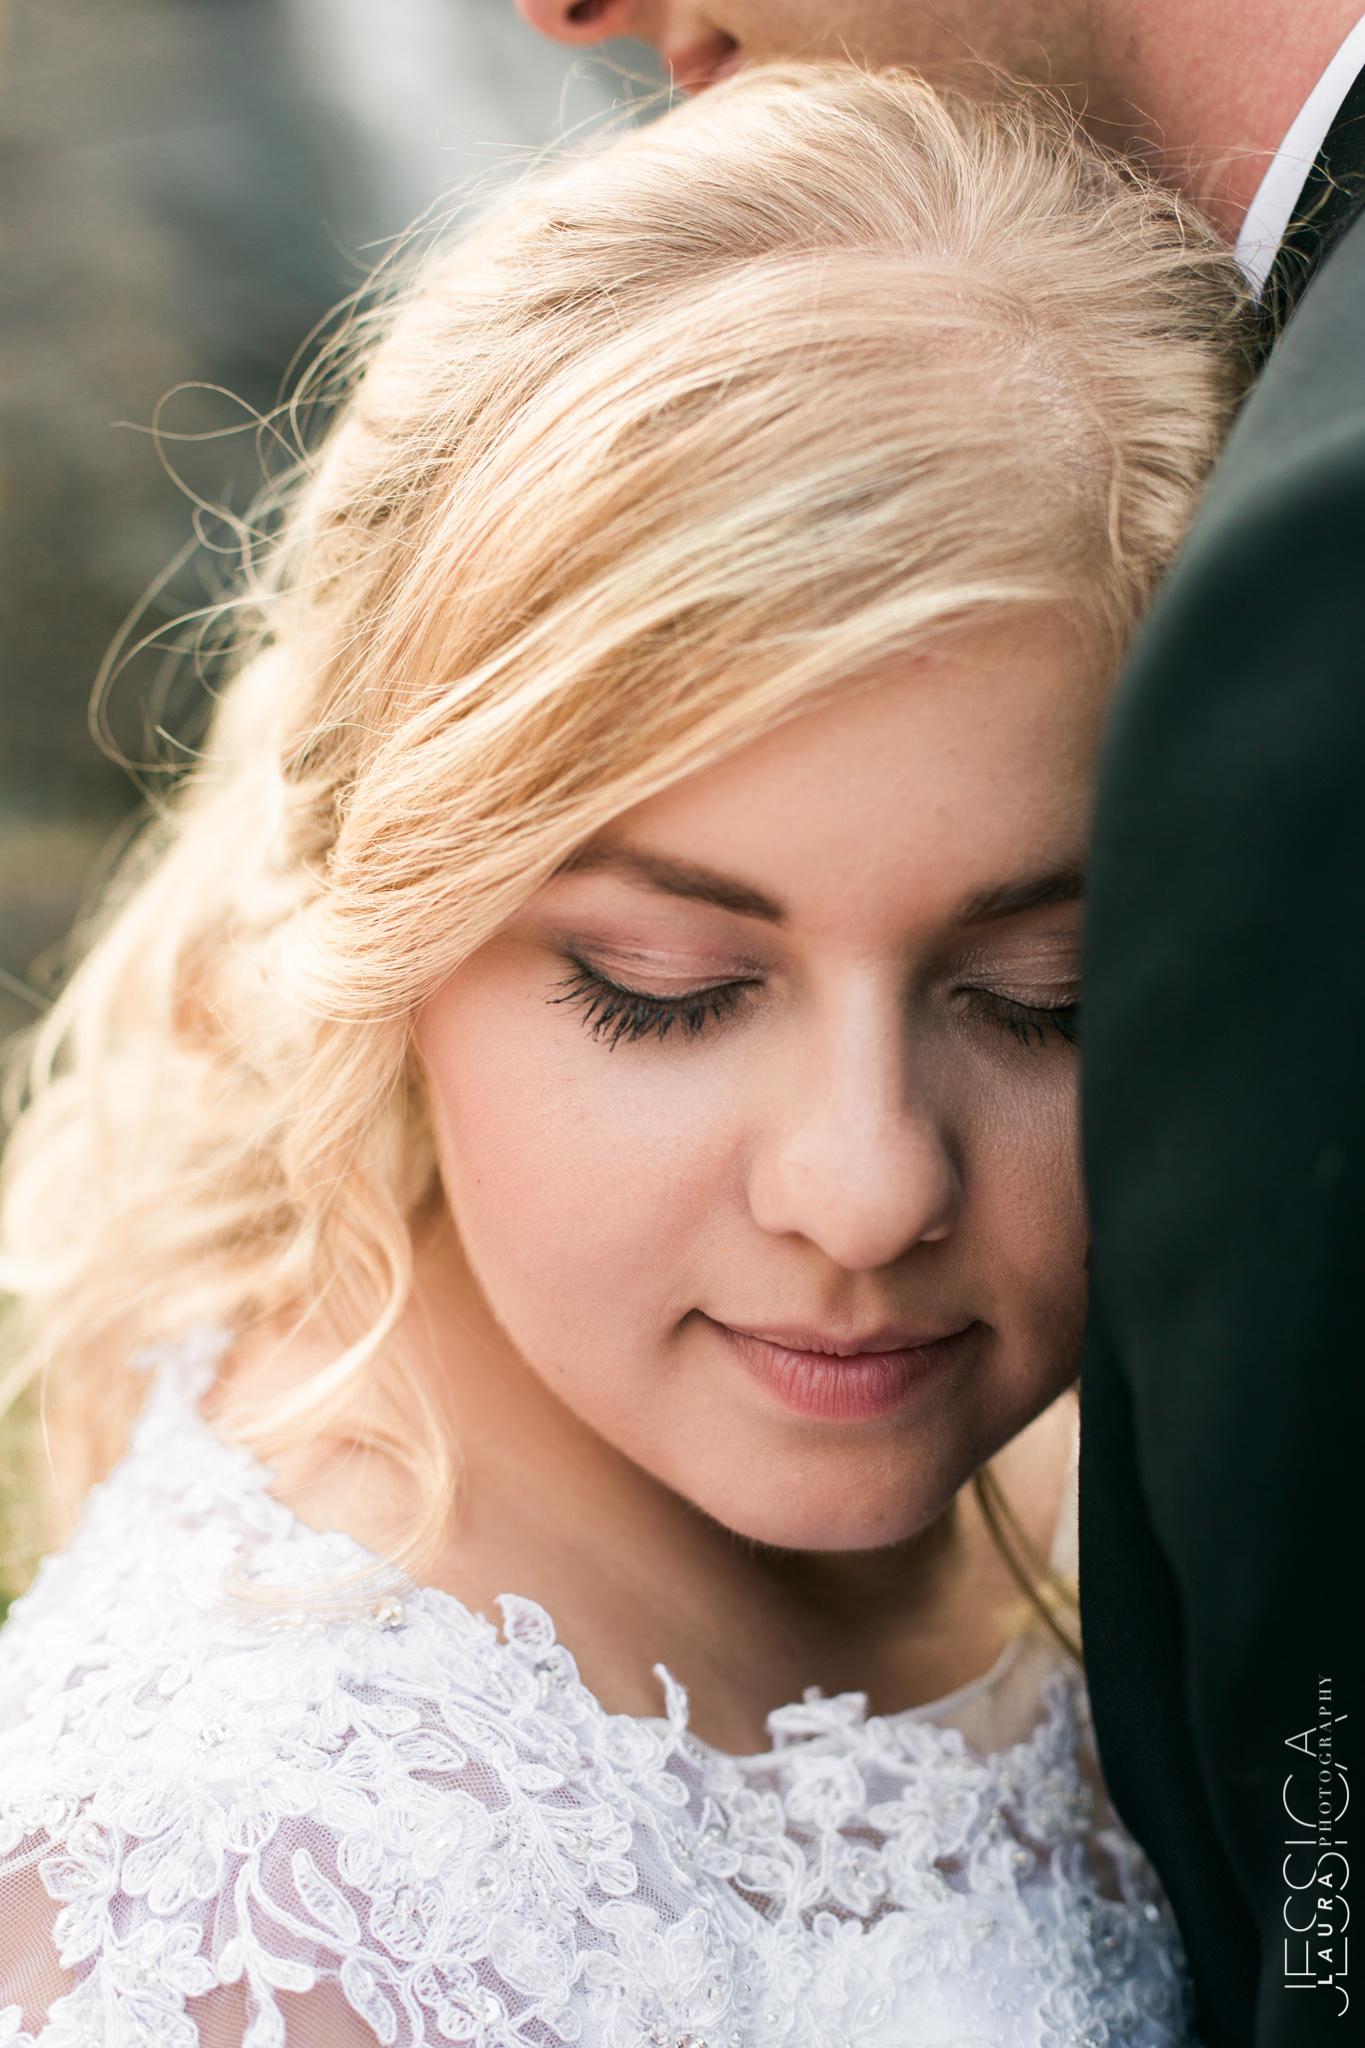 Eugene-Maryana_wedding_08062017_web (548 of 558).JPG